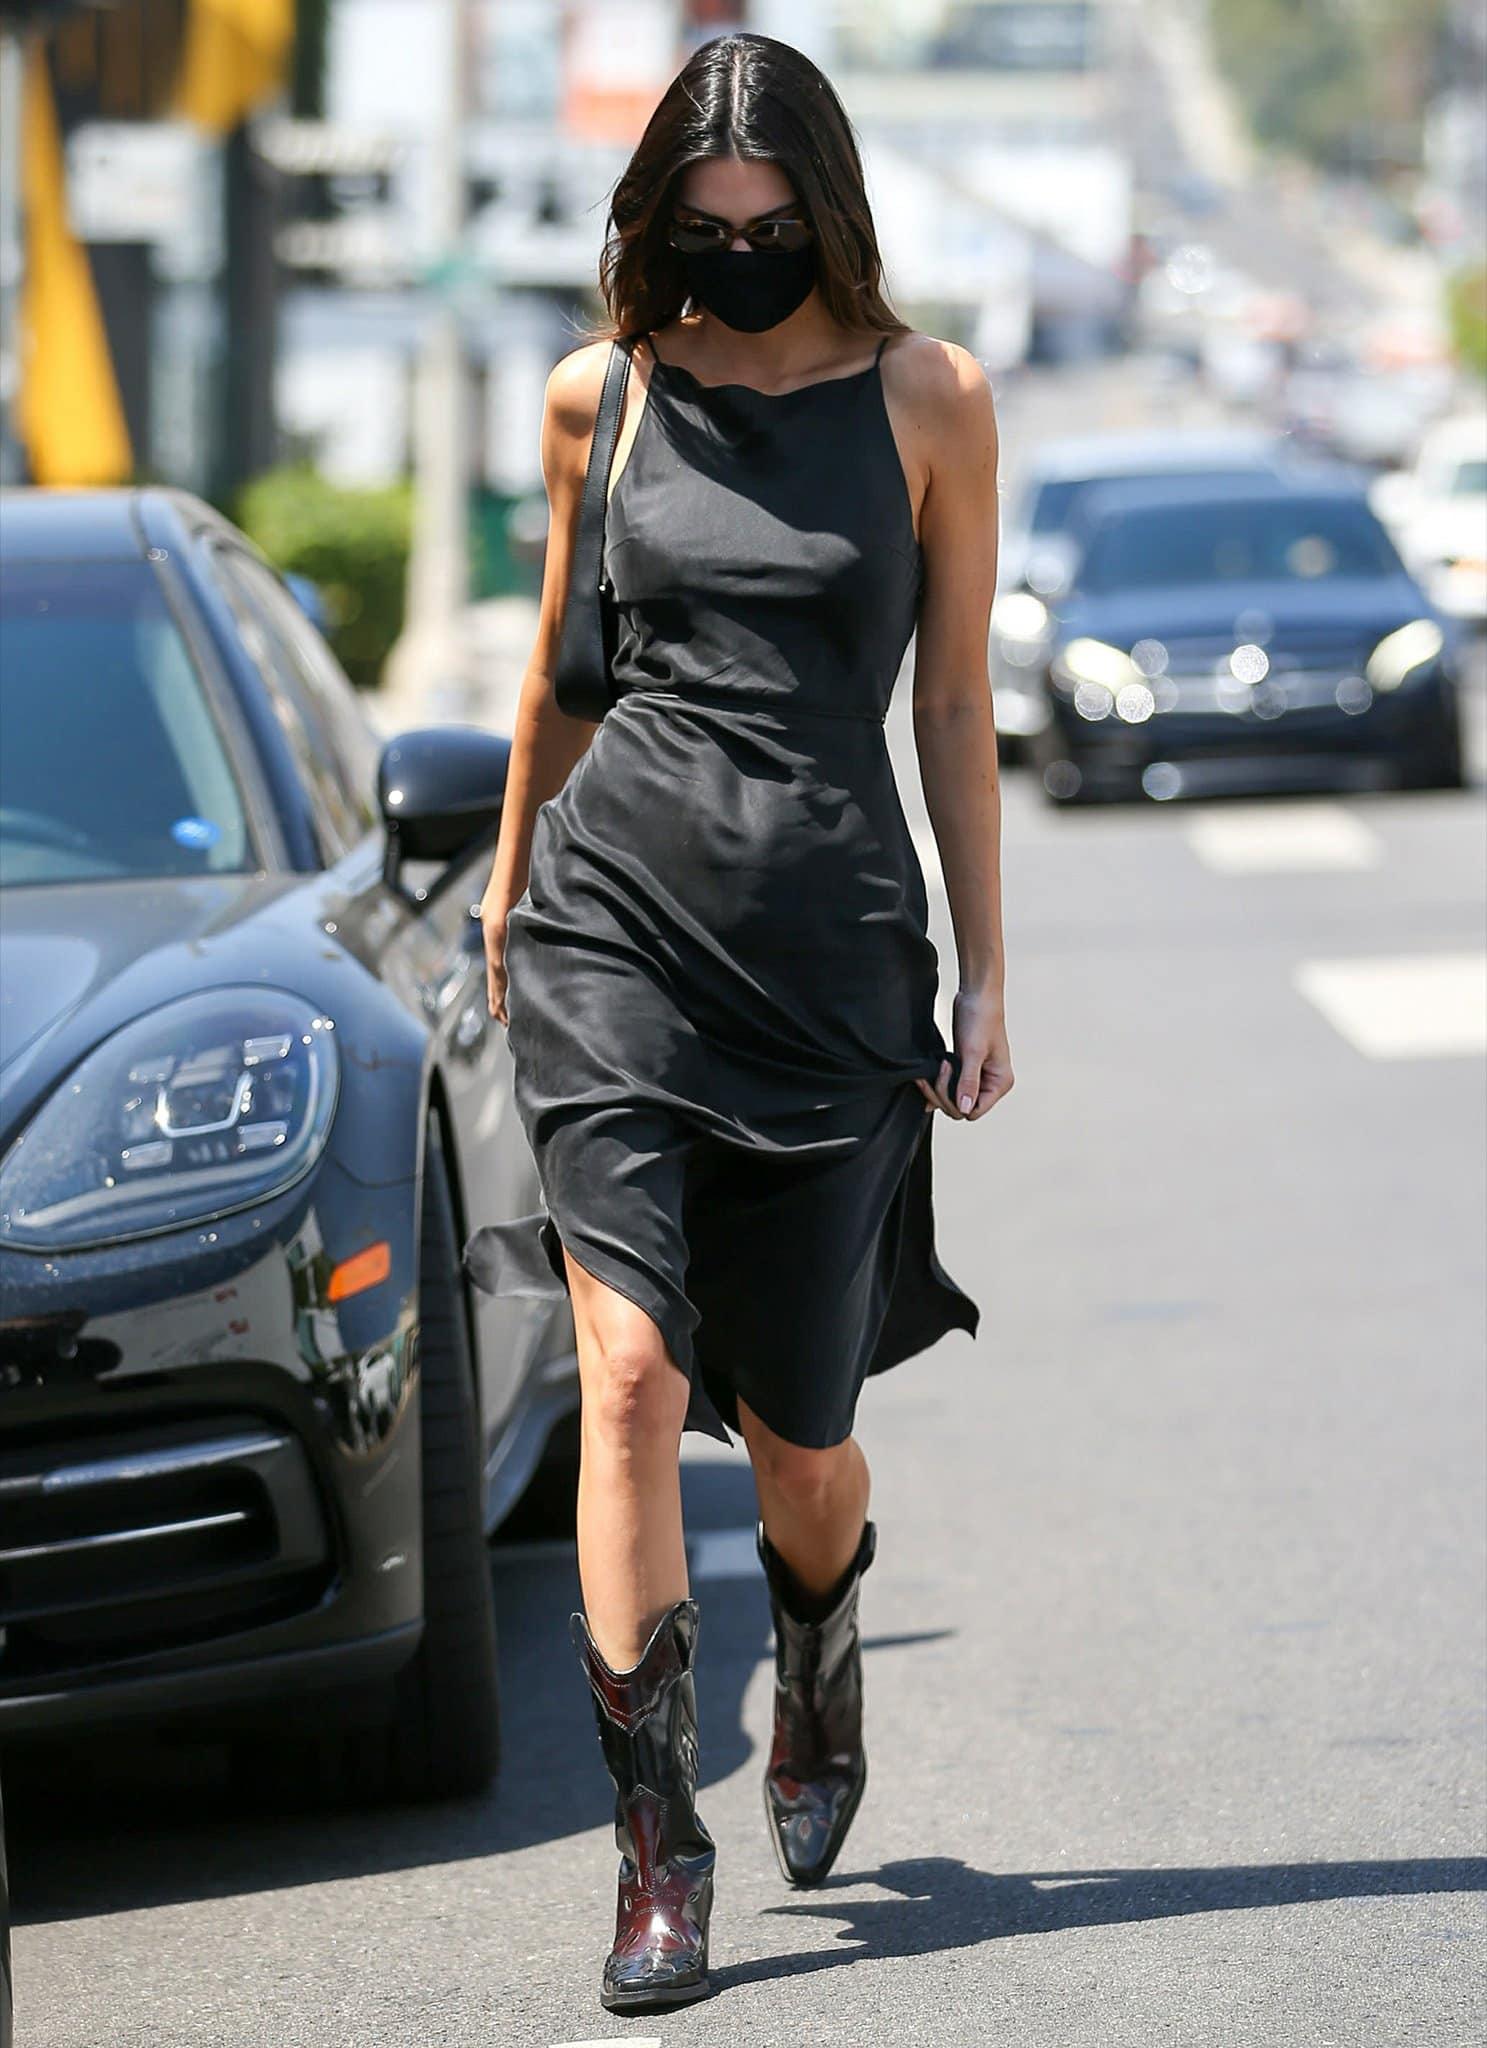 Kendall Jenner flaunts her figure in a slinky LBD